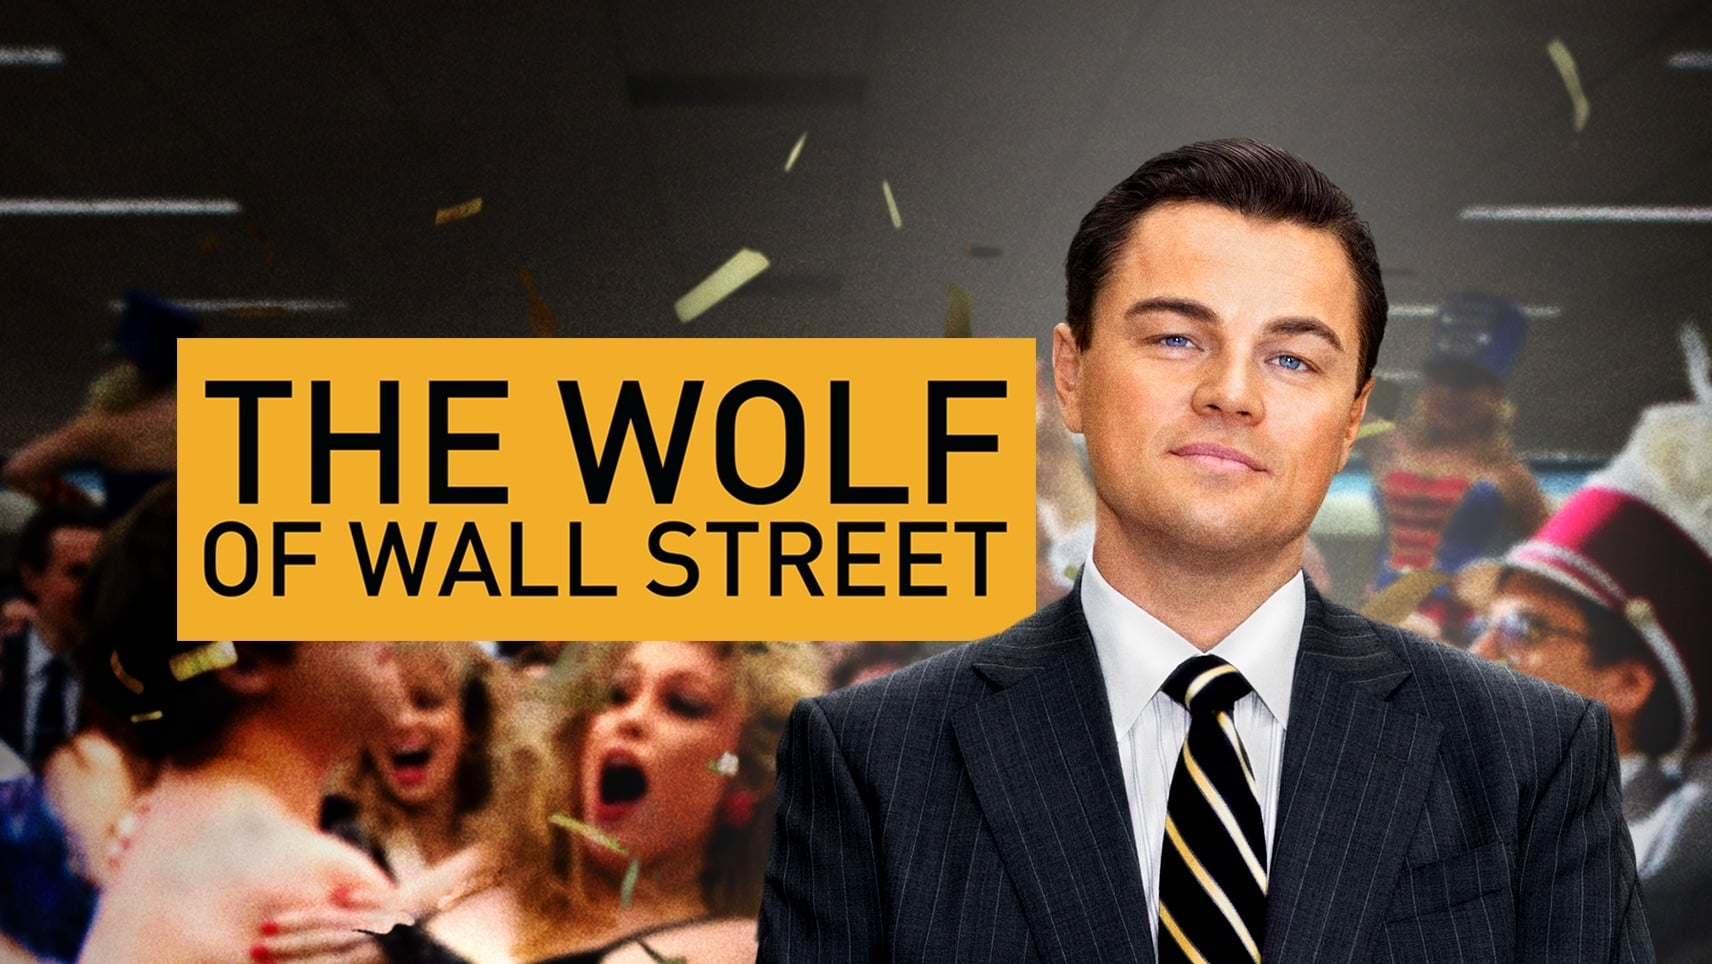 1337x watch the wolf of wall street movie online, free putlocker